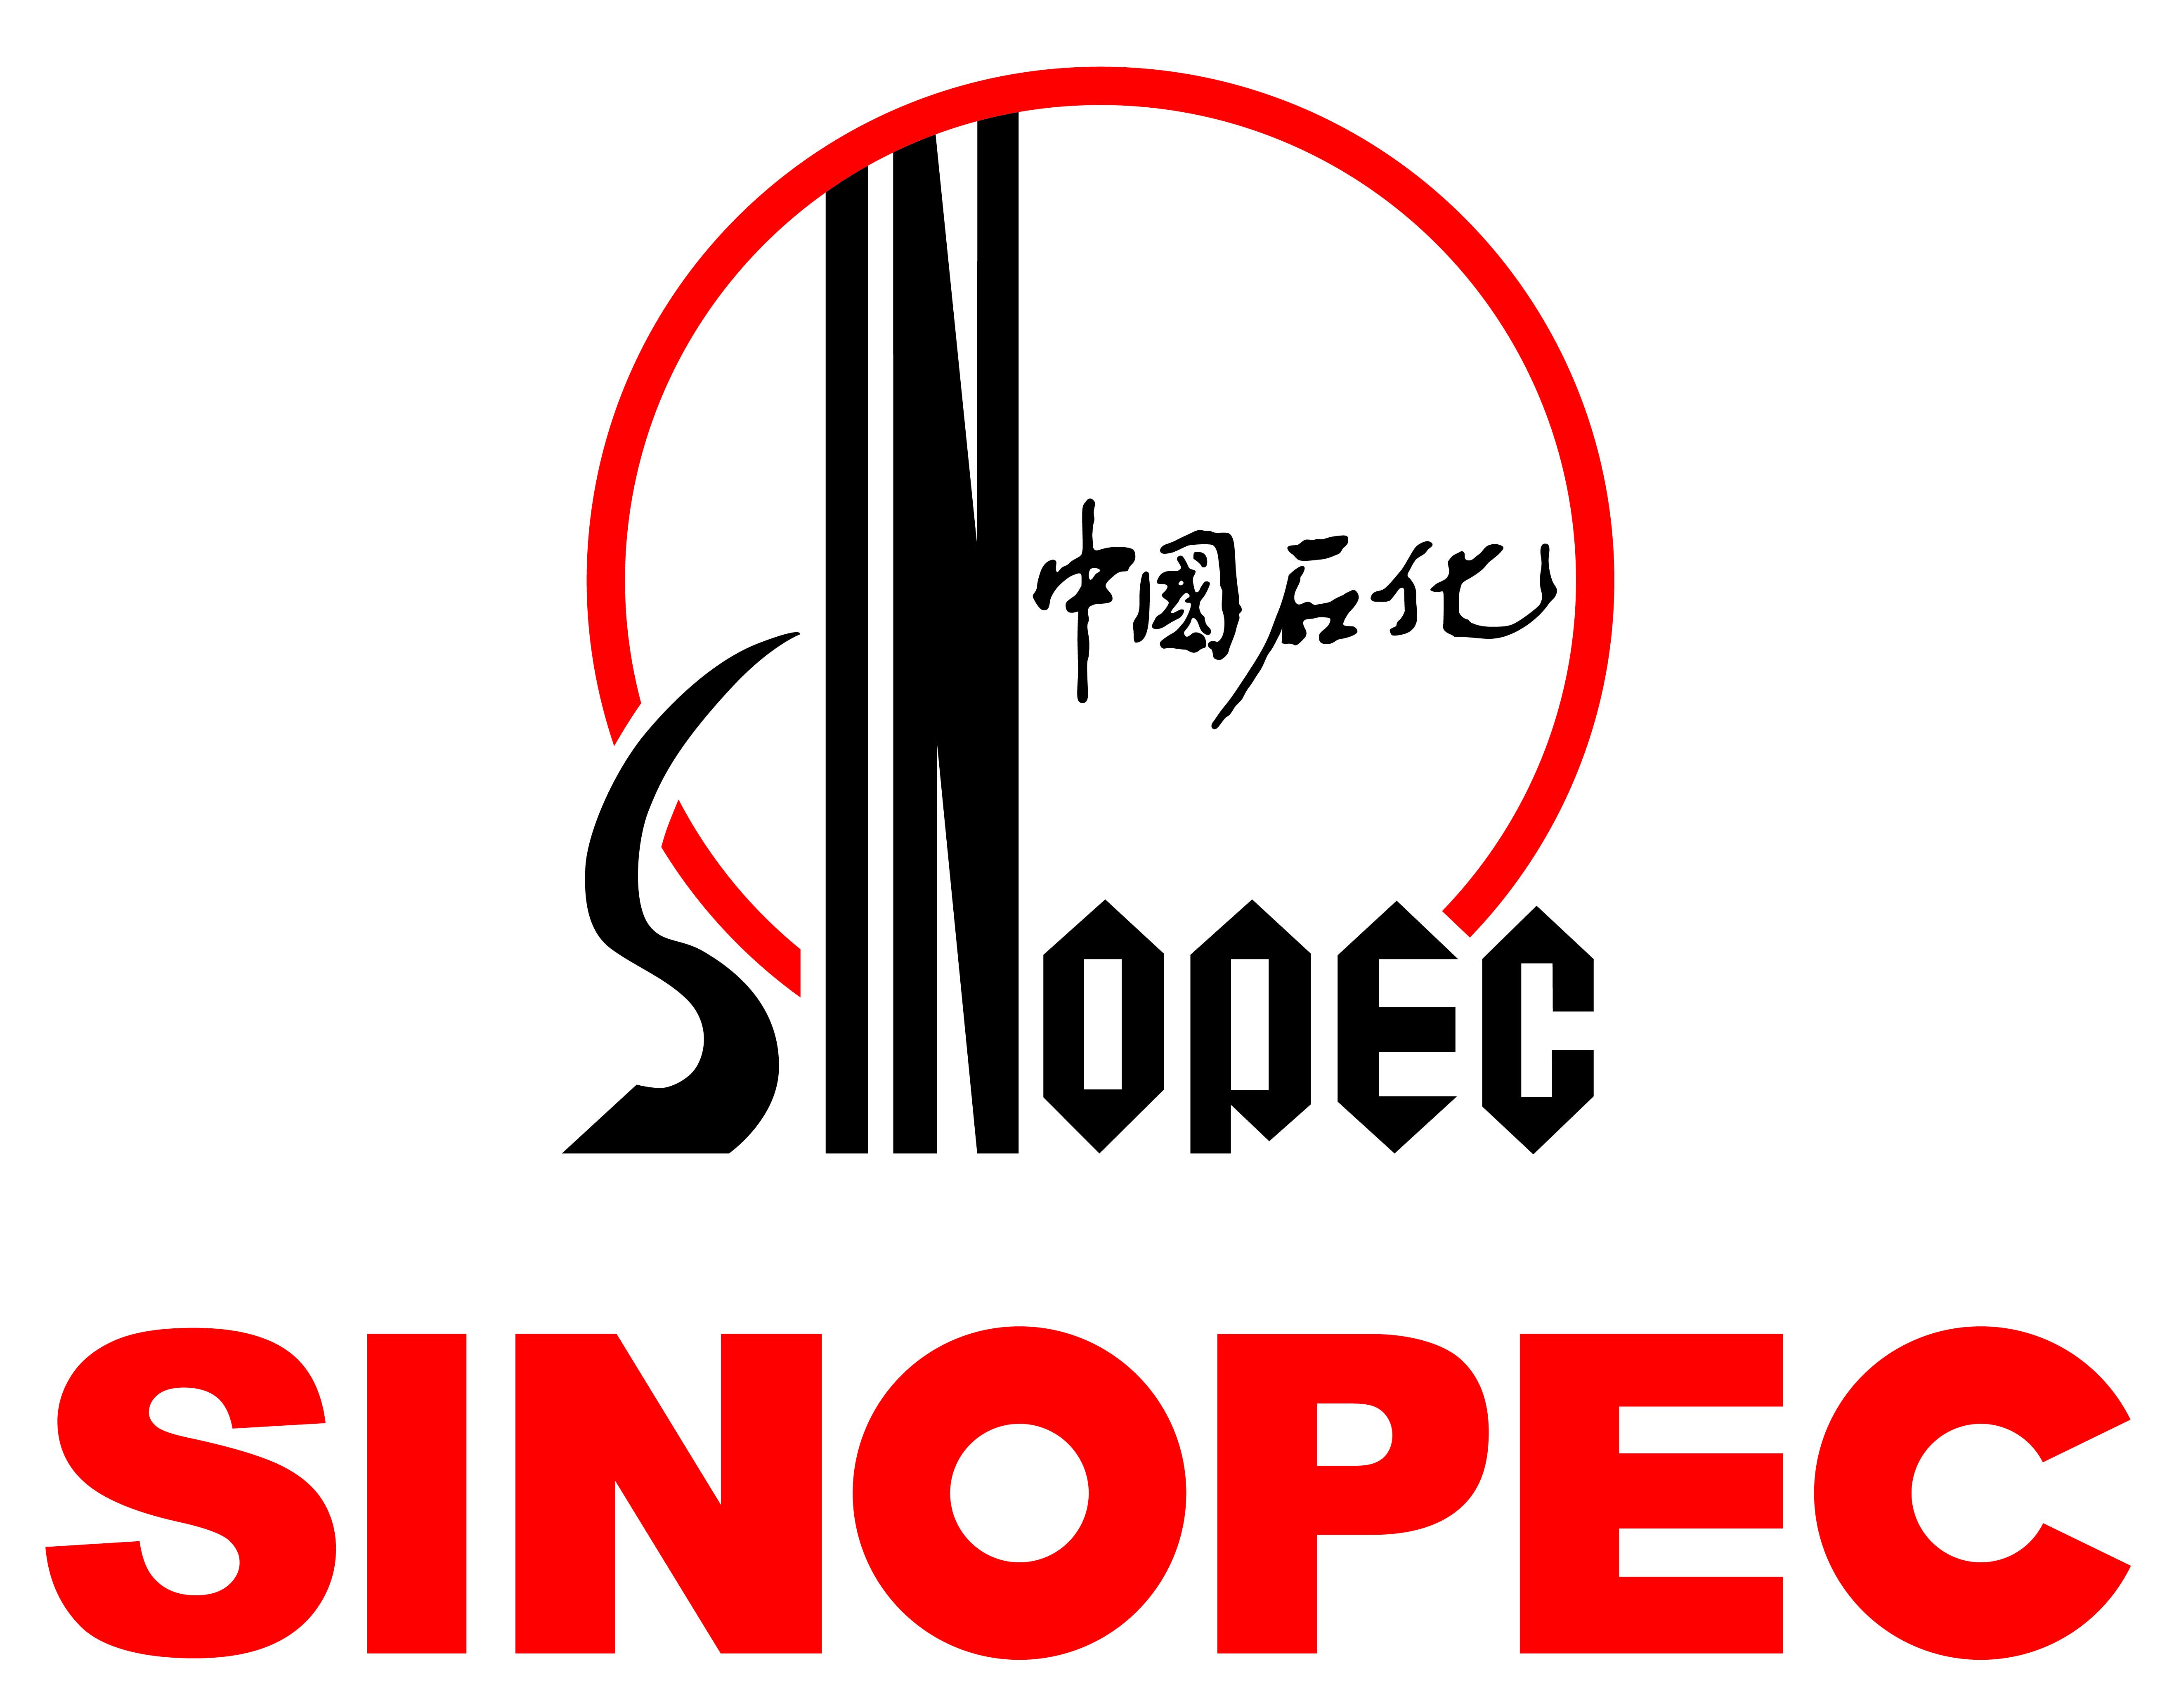 SINOPEC GEOPHYSICAL CORPORATION